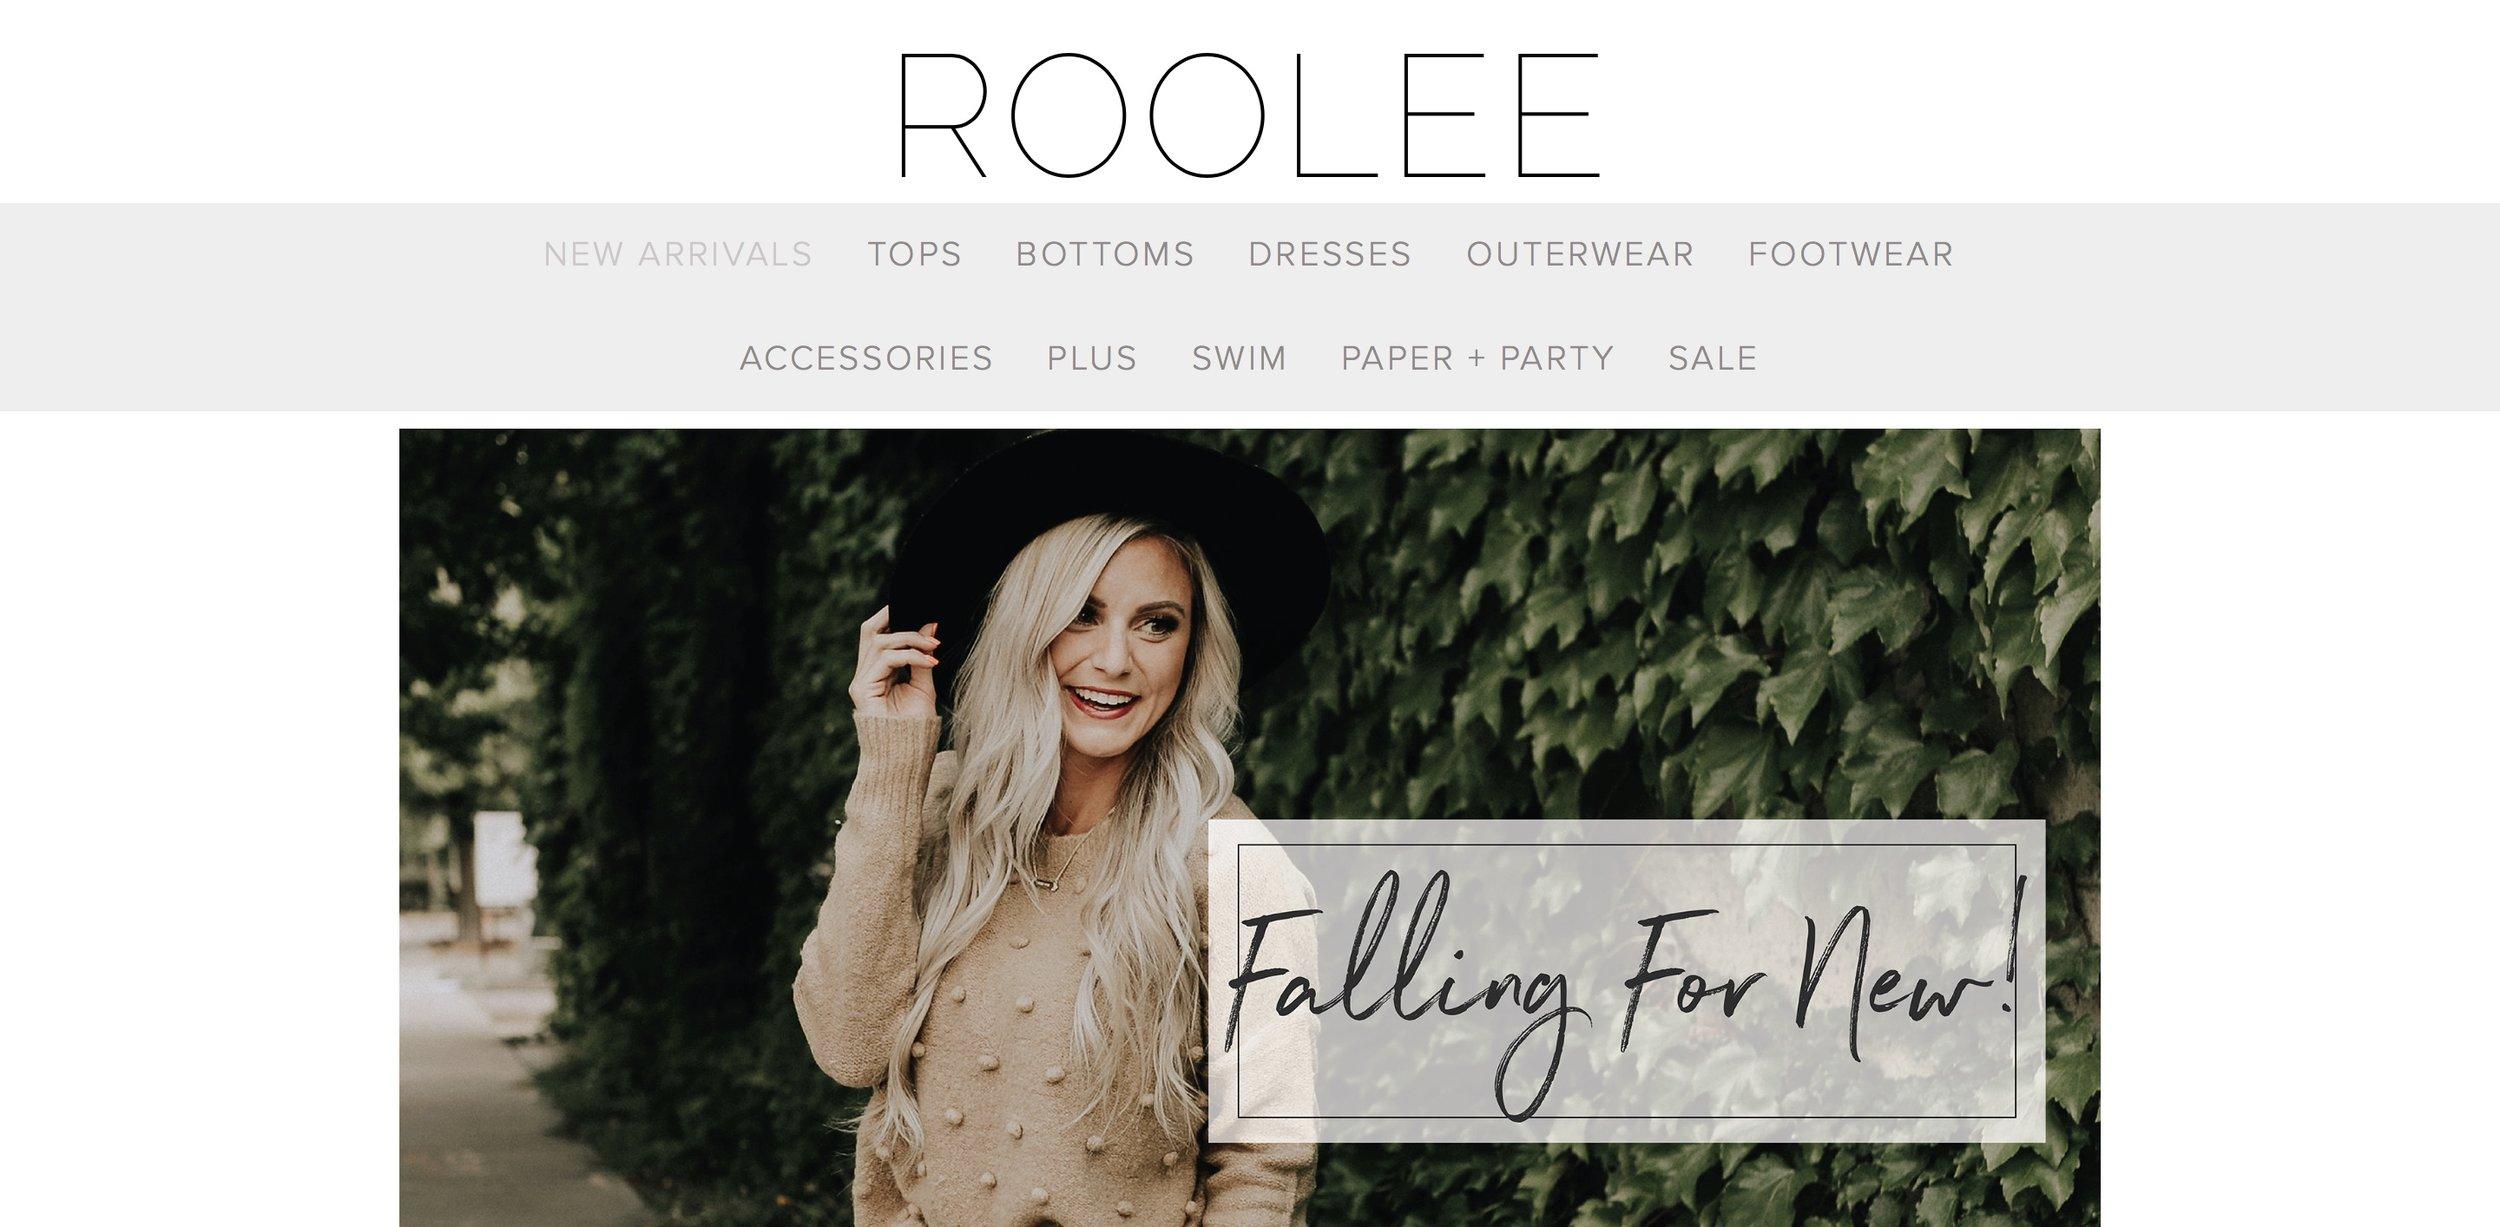 No.1 - Roolee Boutique